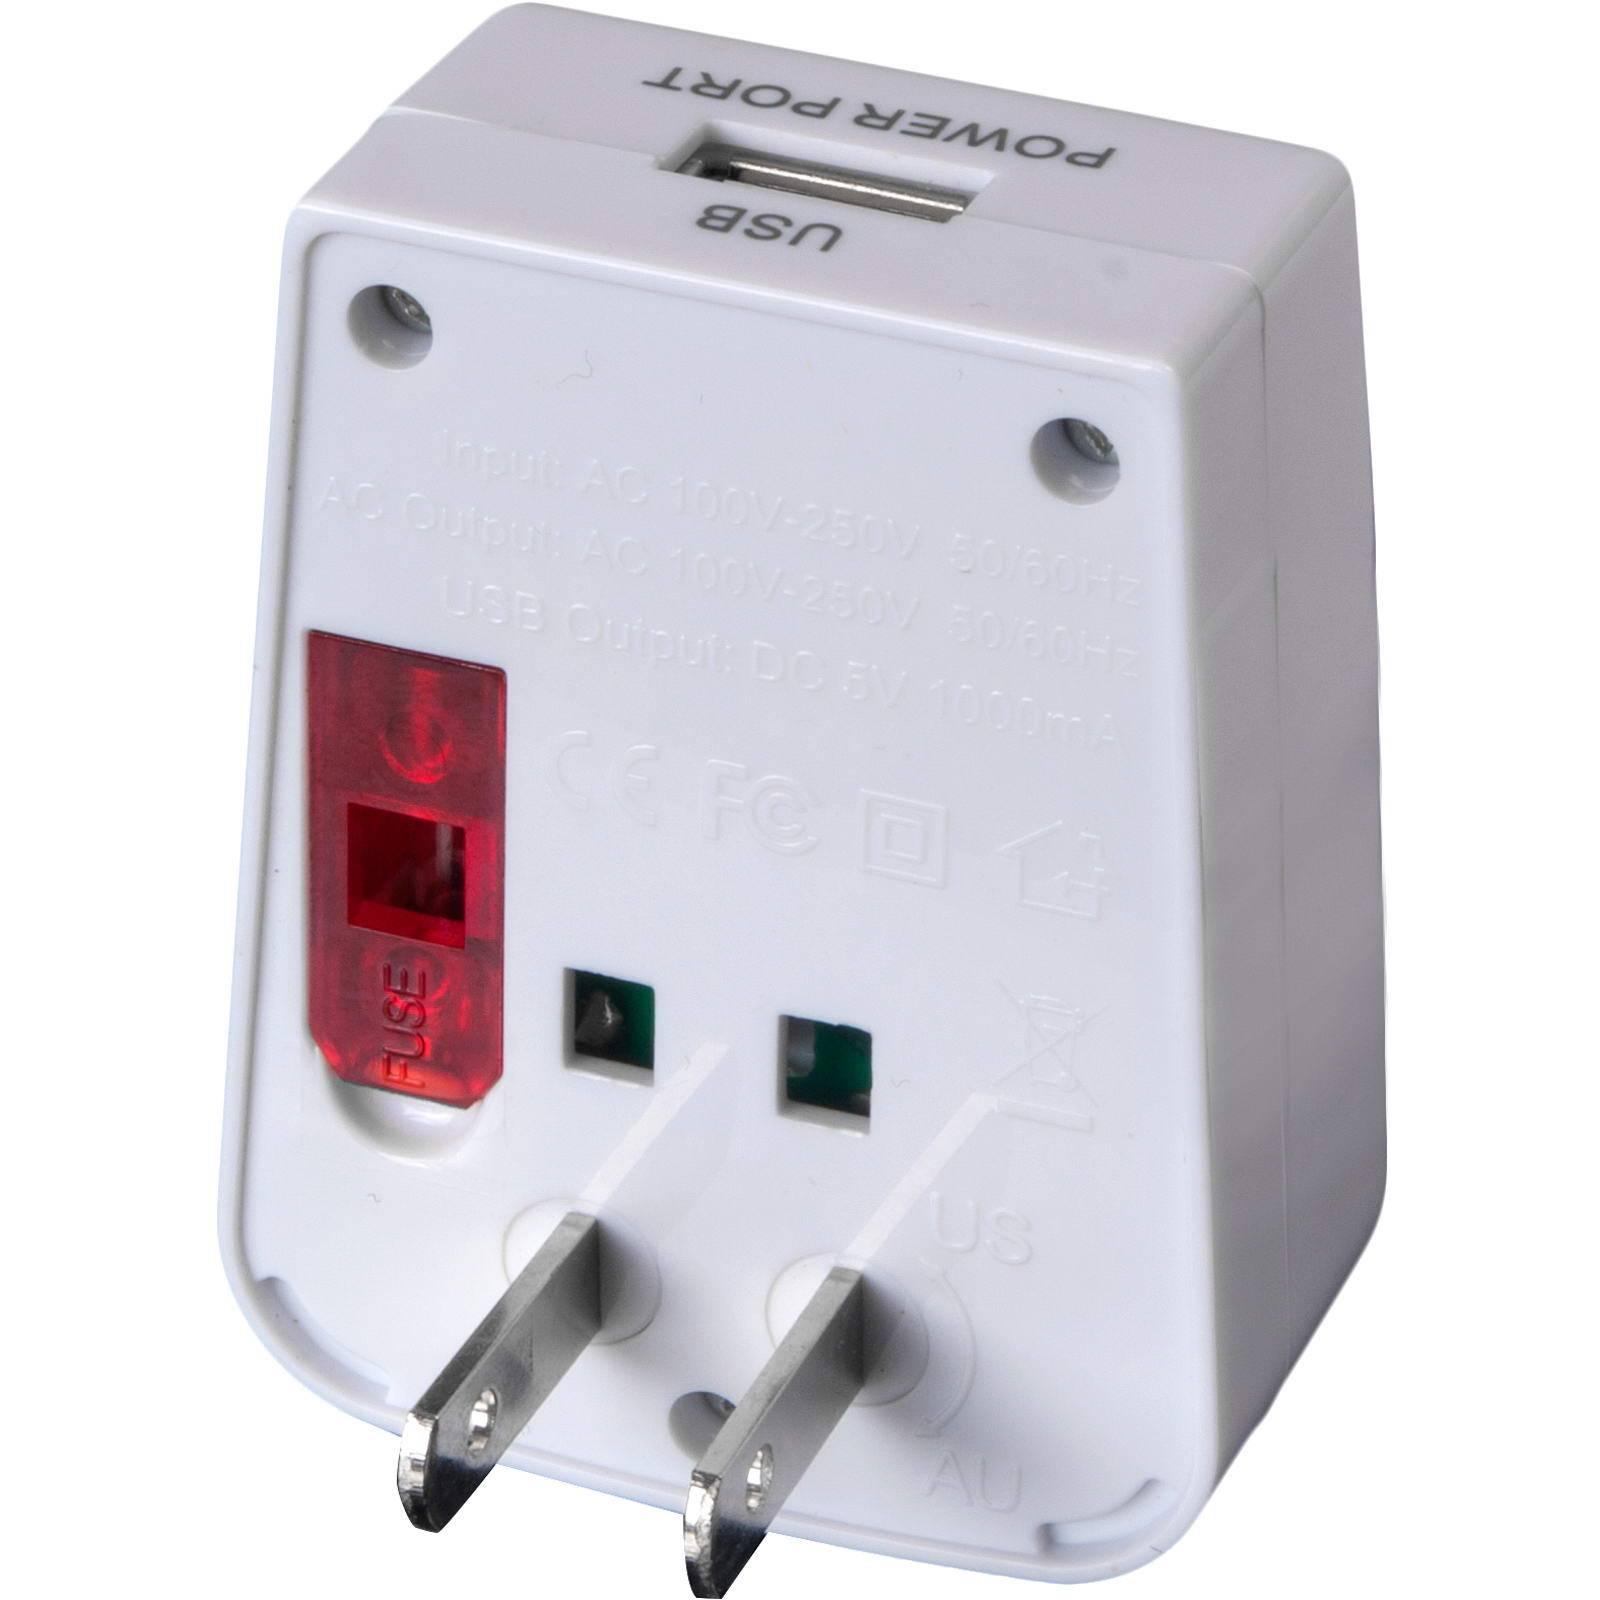 Relags Universal USB Steckeradapter - Bild 5